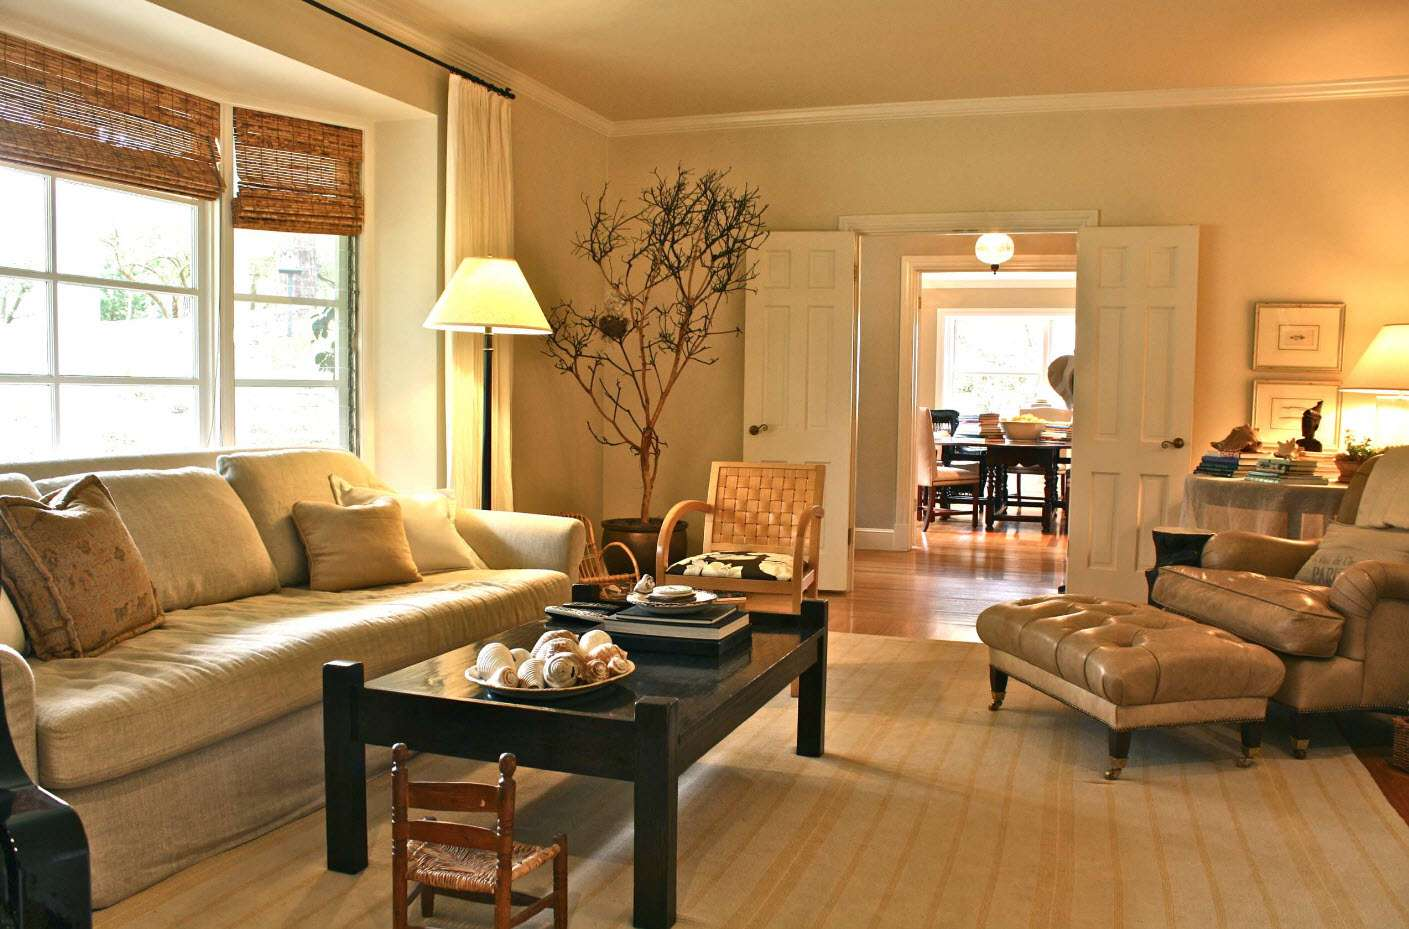 интерьер гостиной со шторами